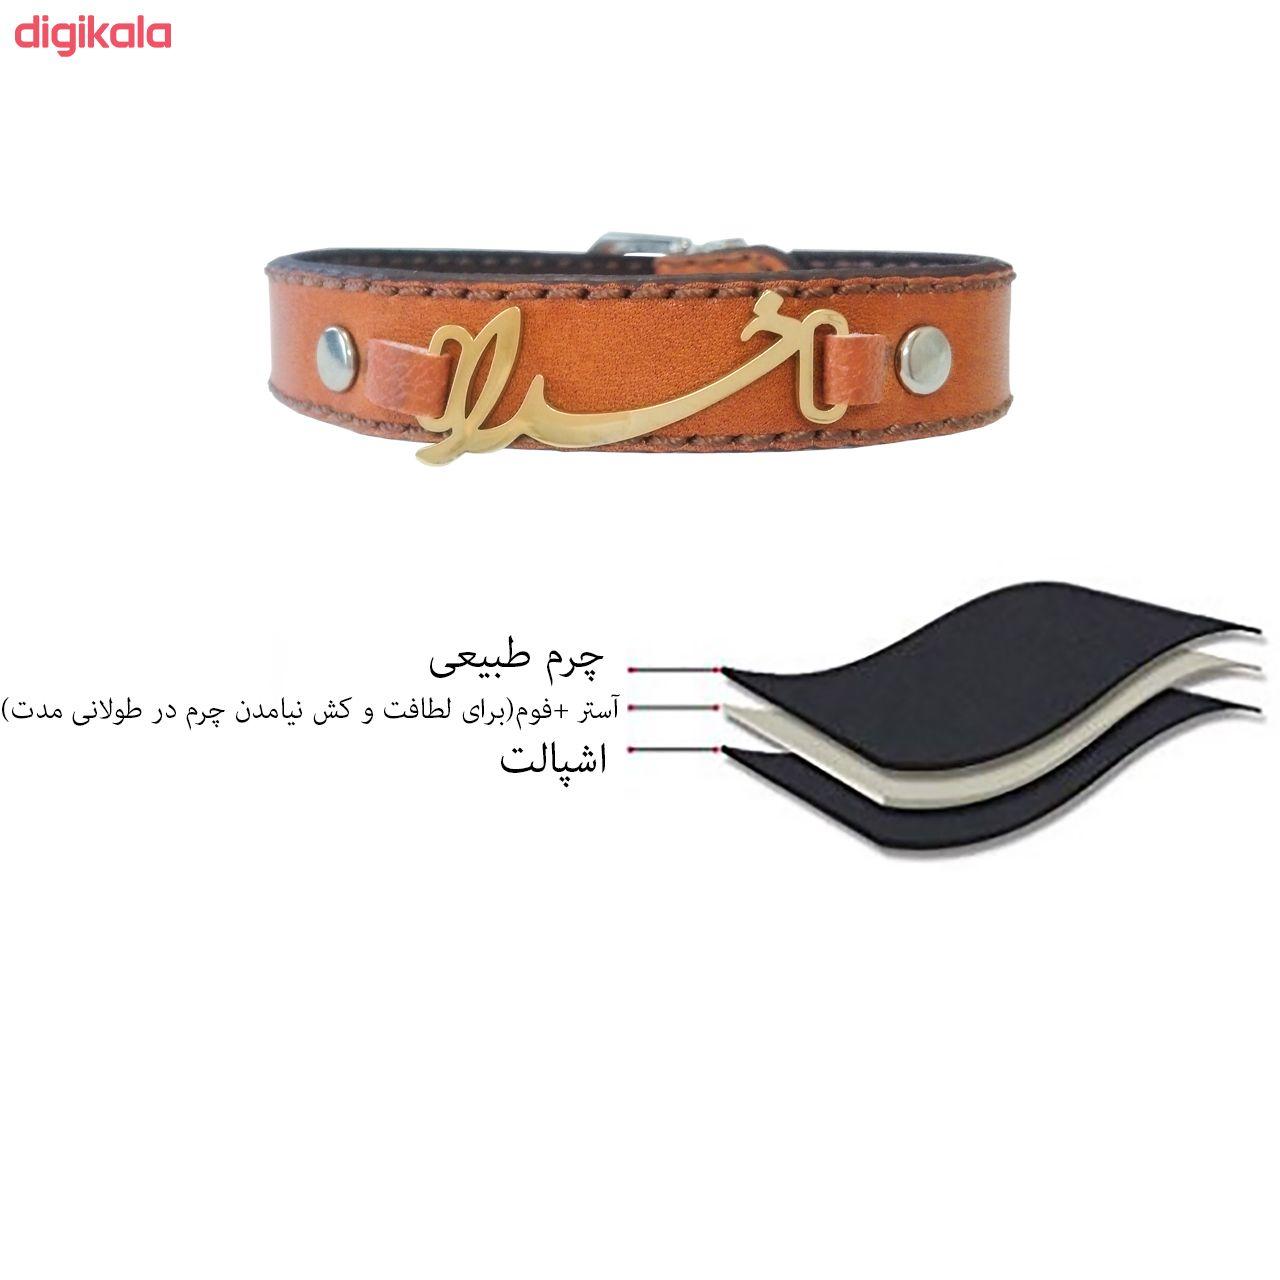 دستبند چرم وارک طرح خدا مدل پرهام کد rb50 main 1 13